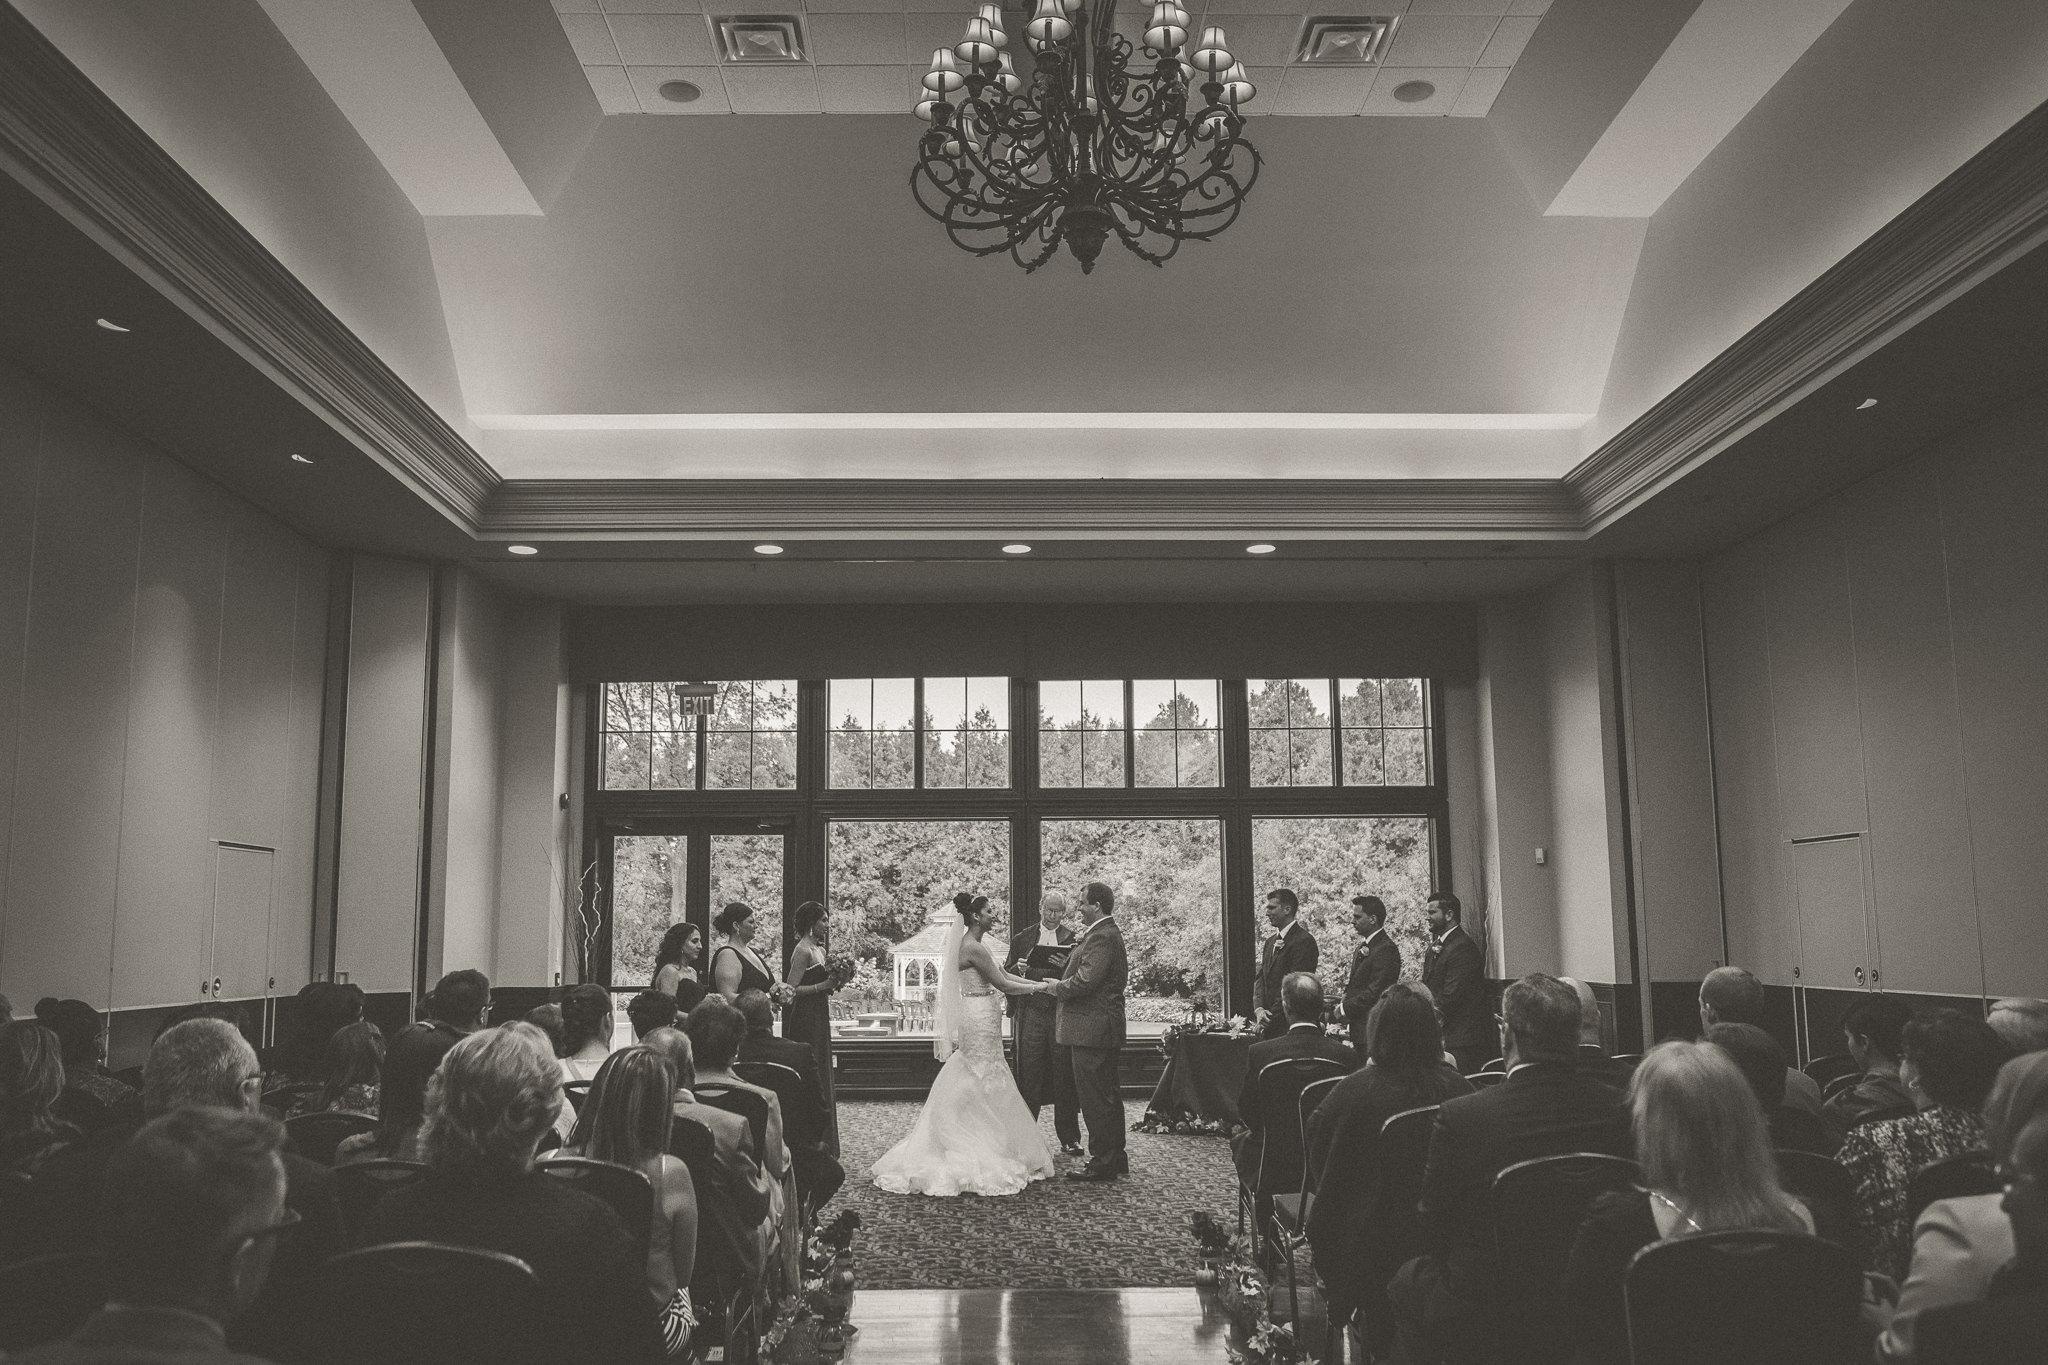 deer creek banquet facility wedding photos 551 - Deer Creek Wedding Photos